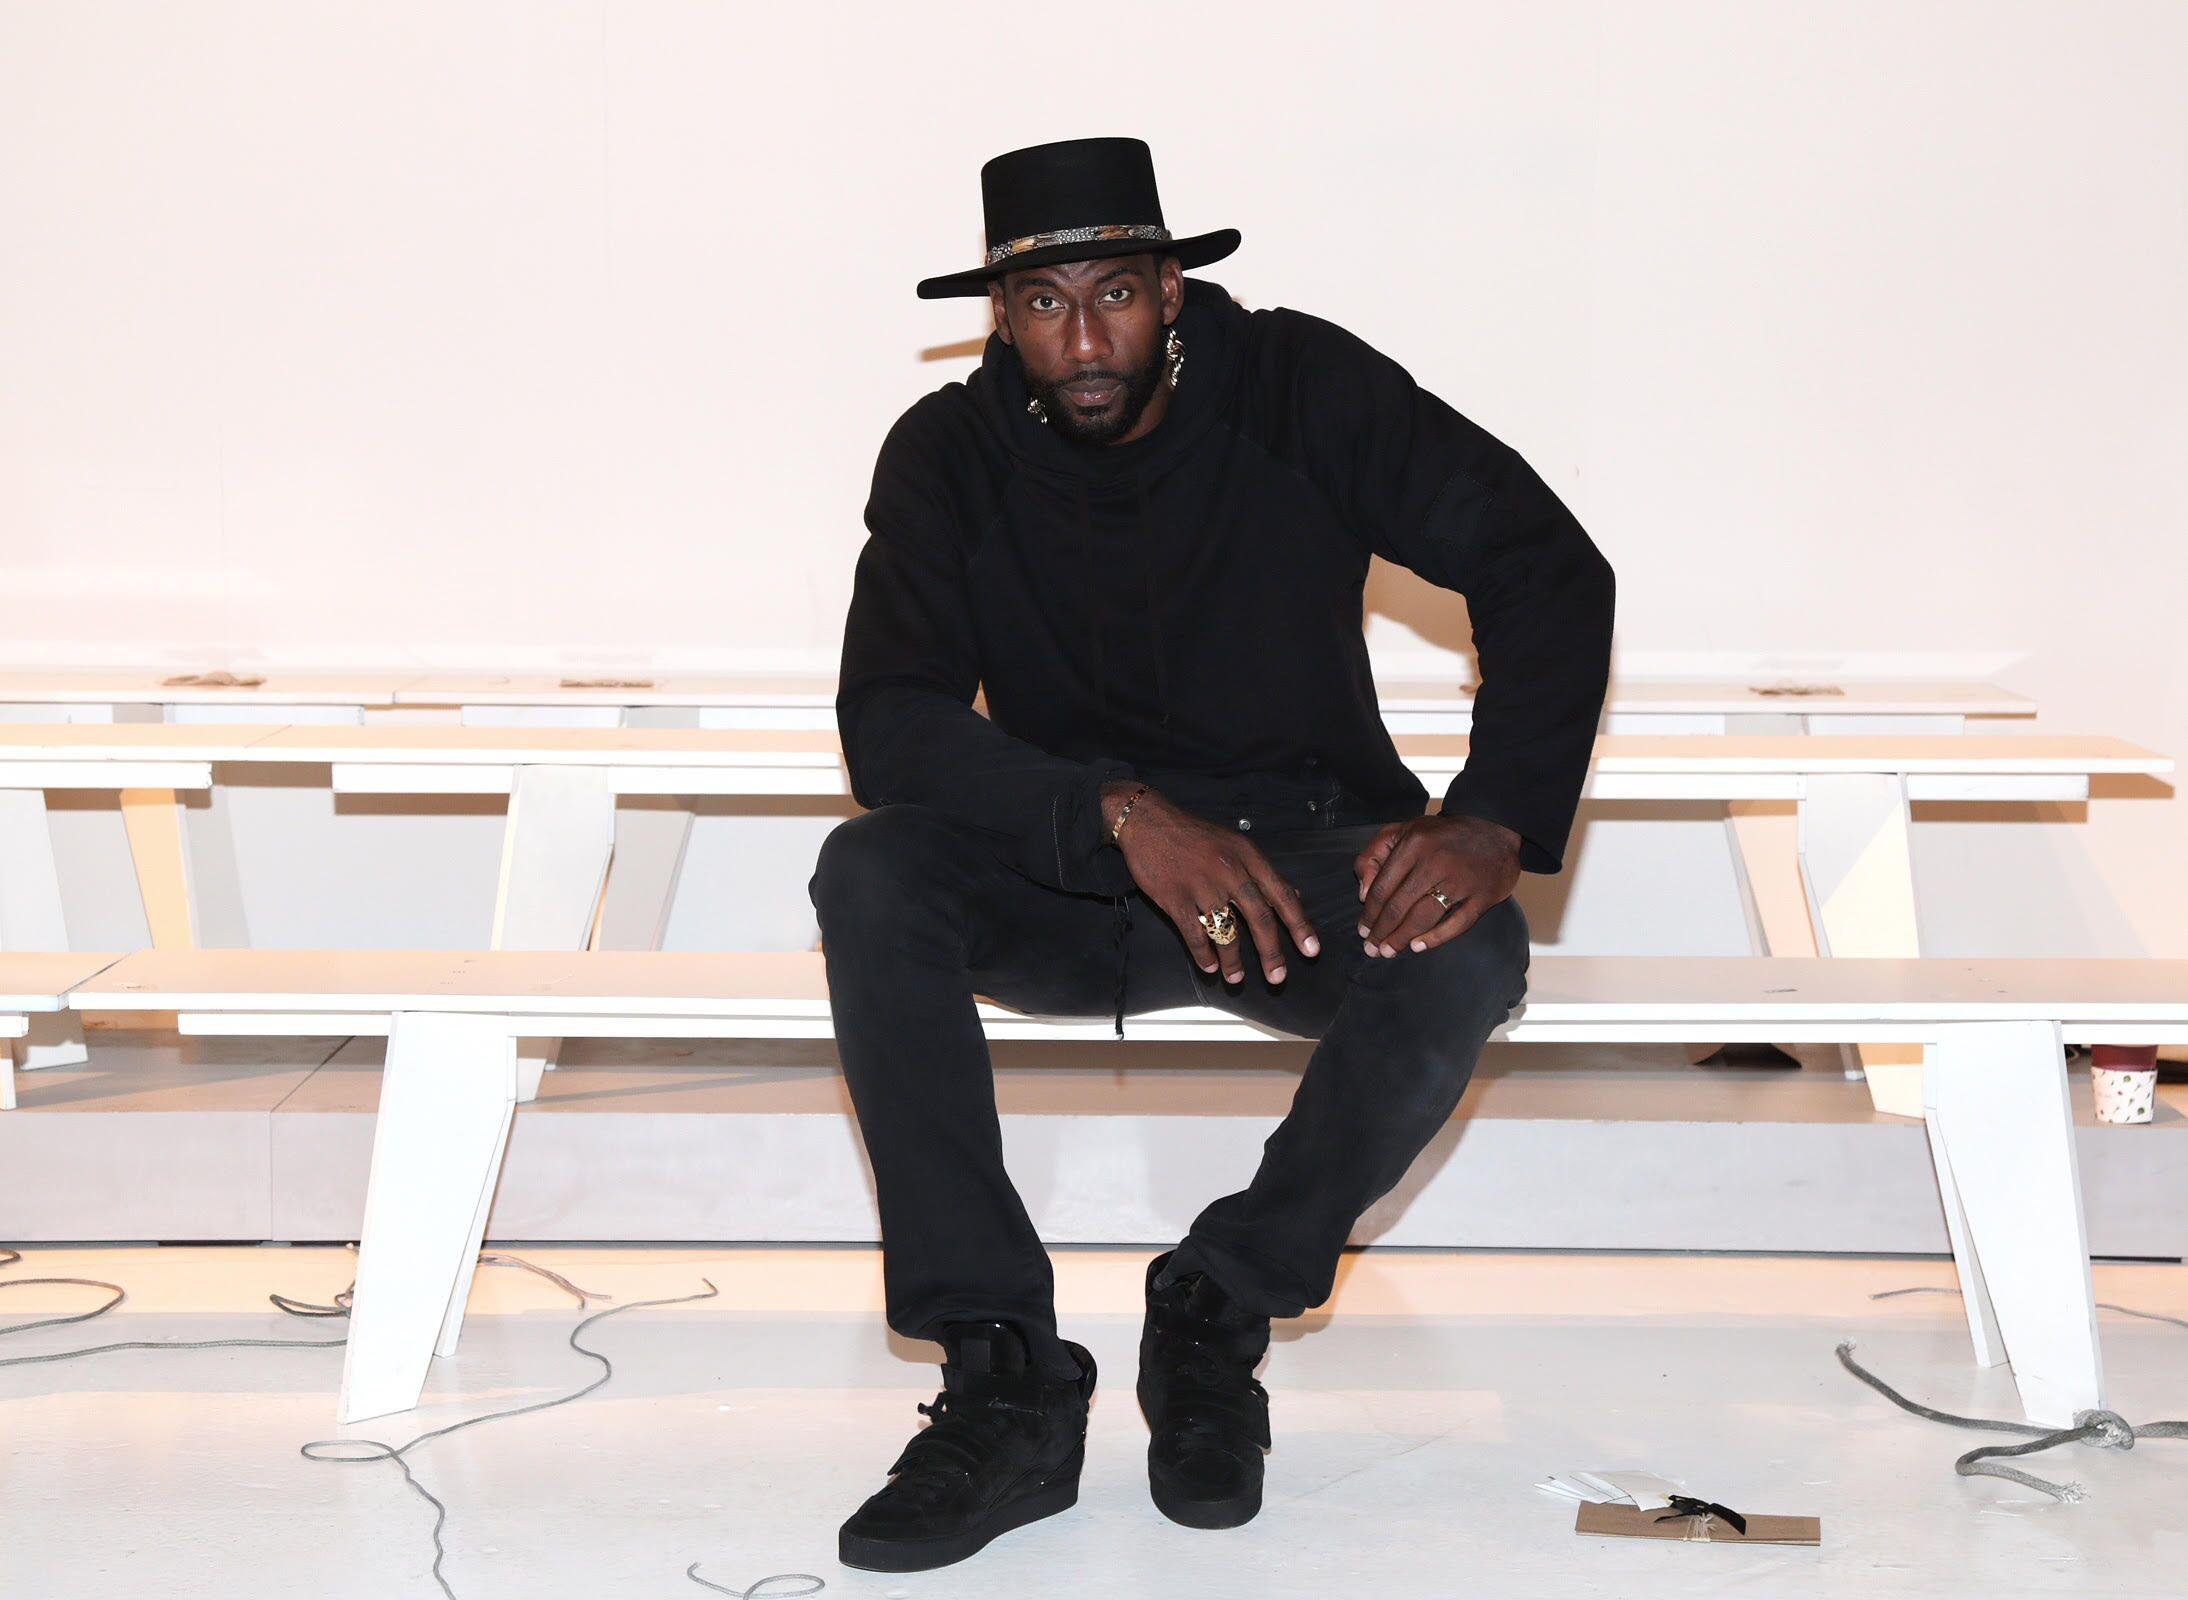 SCOPE Miami Beach 2017 x Amar'e Stoudemire's The Melech Collection